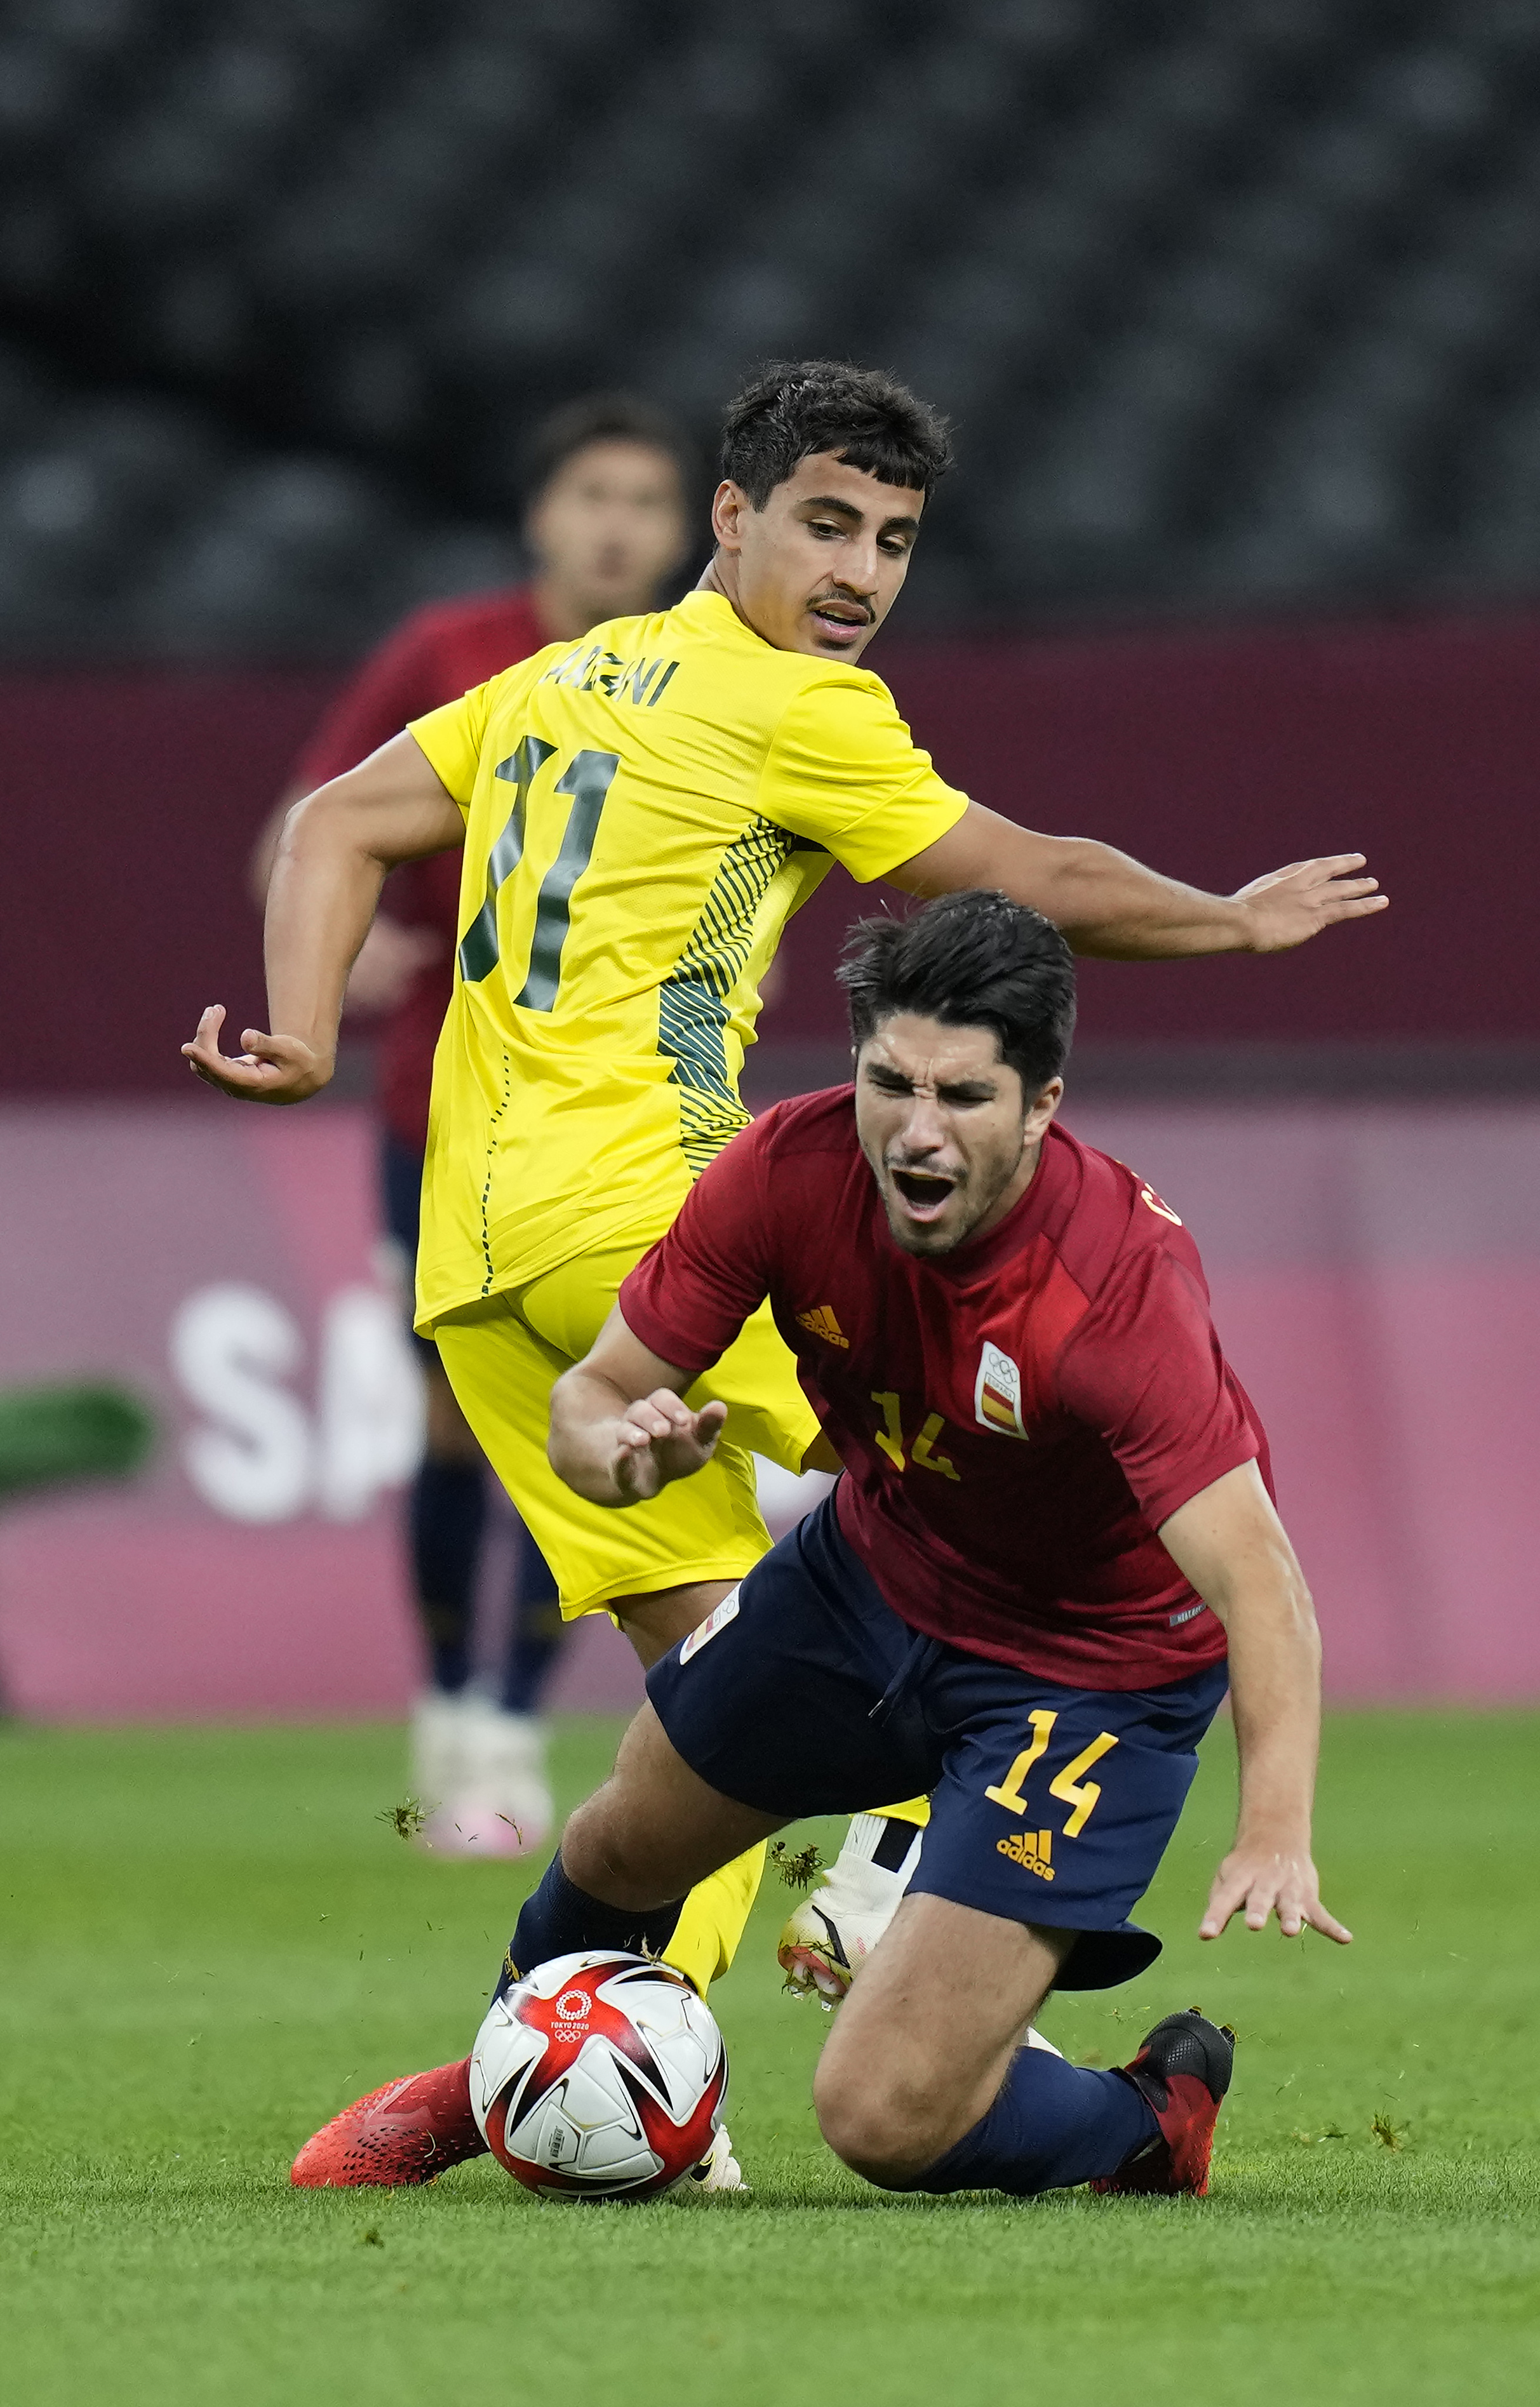 España Australia - fútbol - Juegos Olímpicos 2021 - Tokio 2020